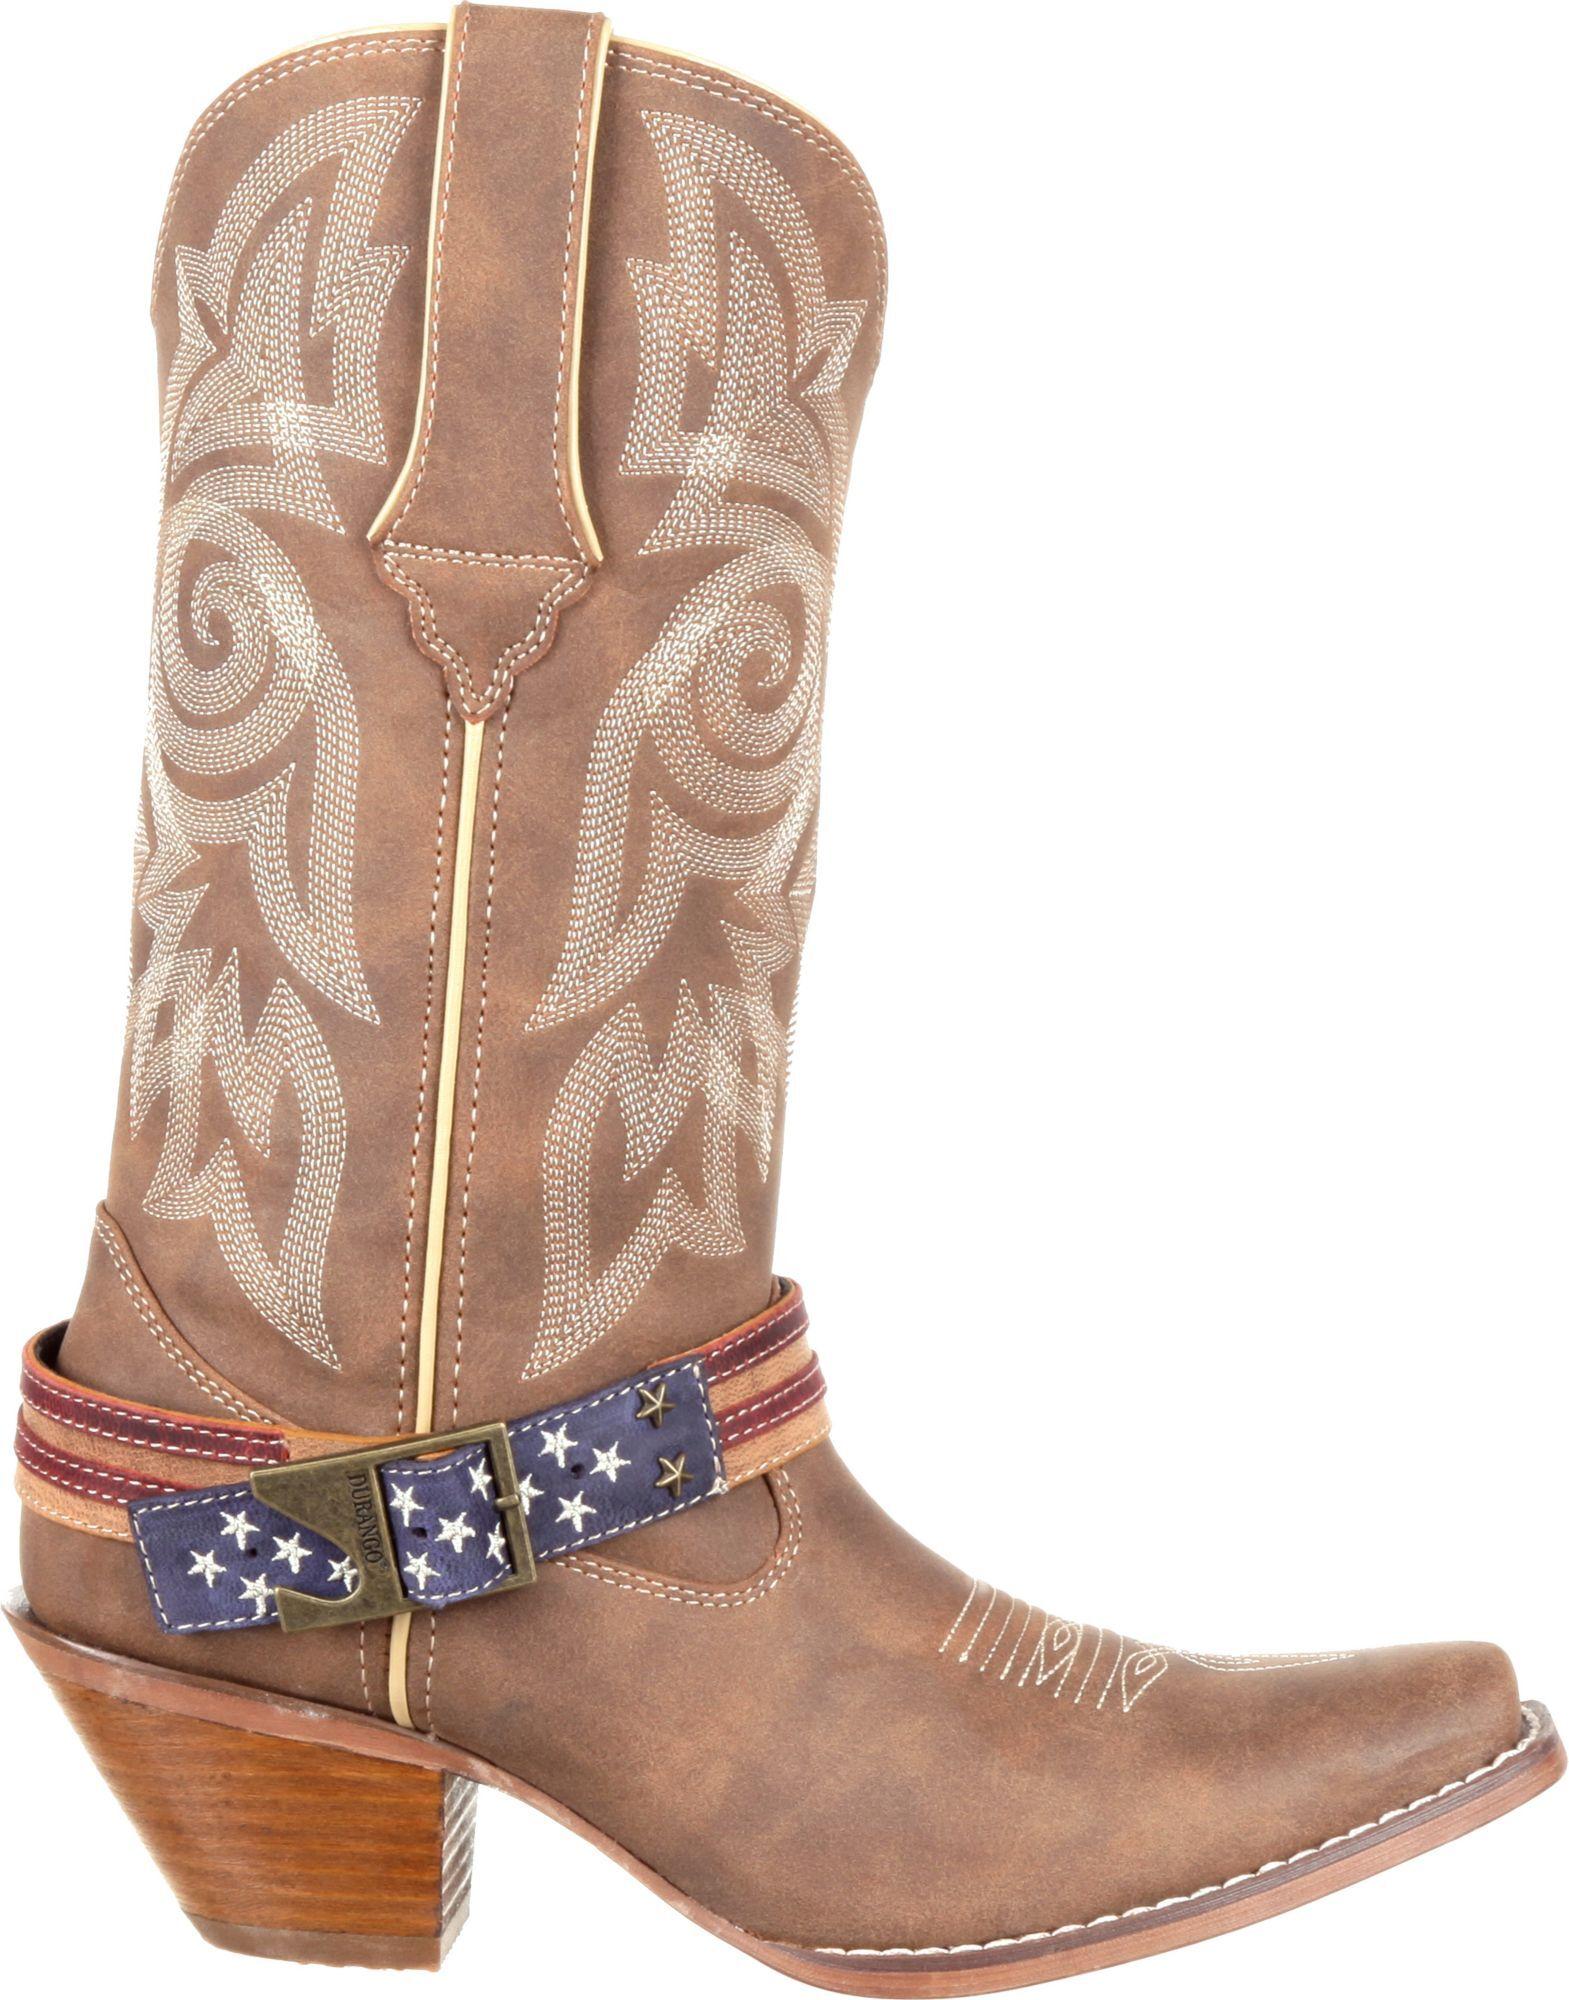 Durango Women's Crush Flag Accessory Western Boots, Brown